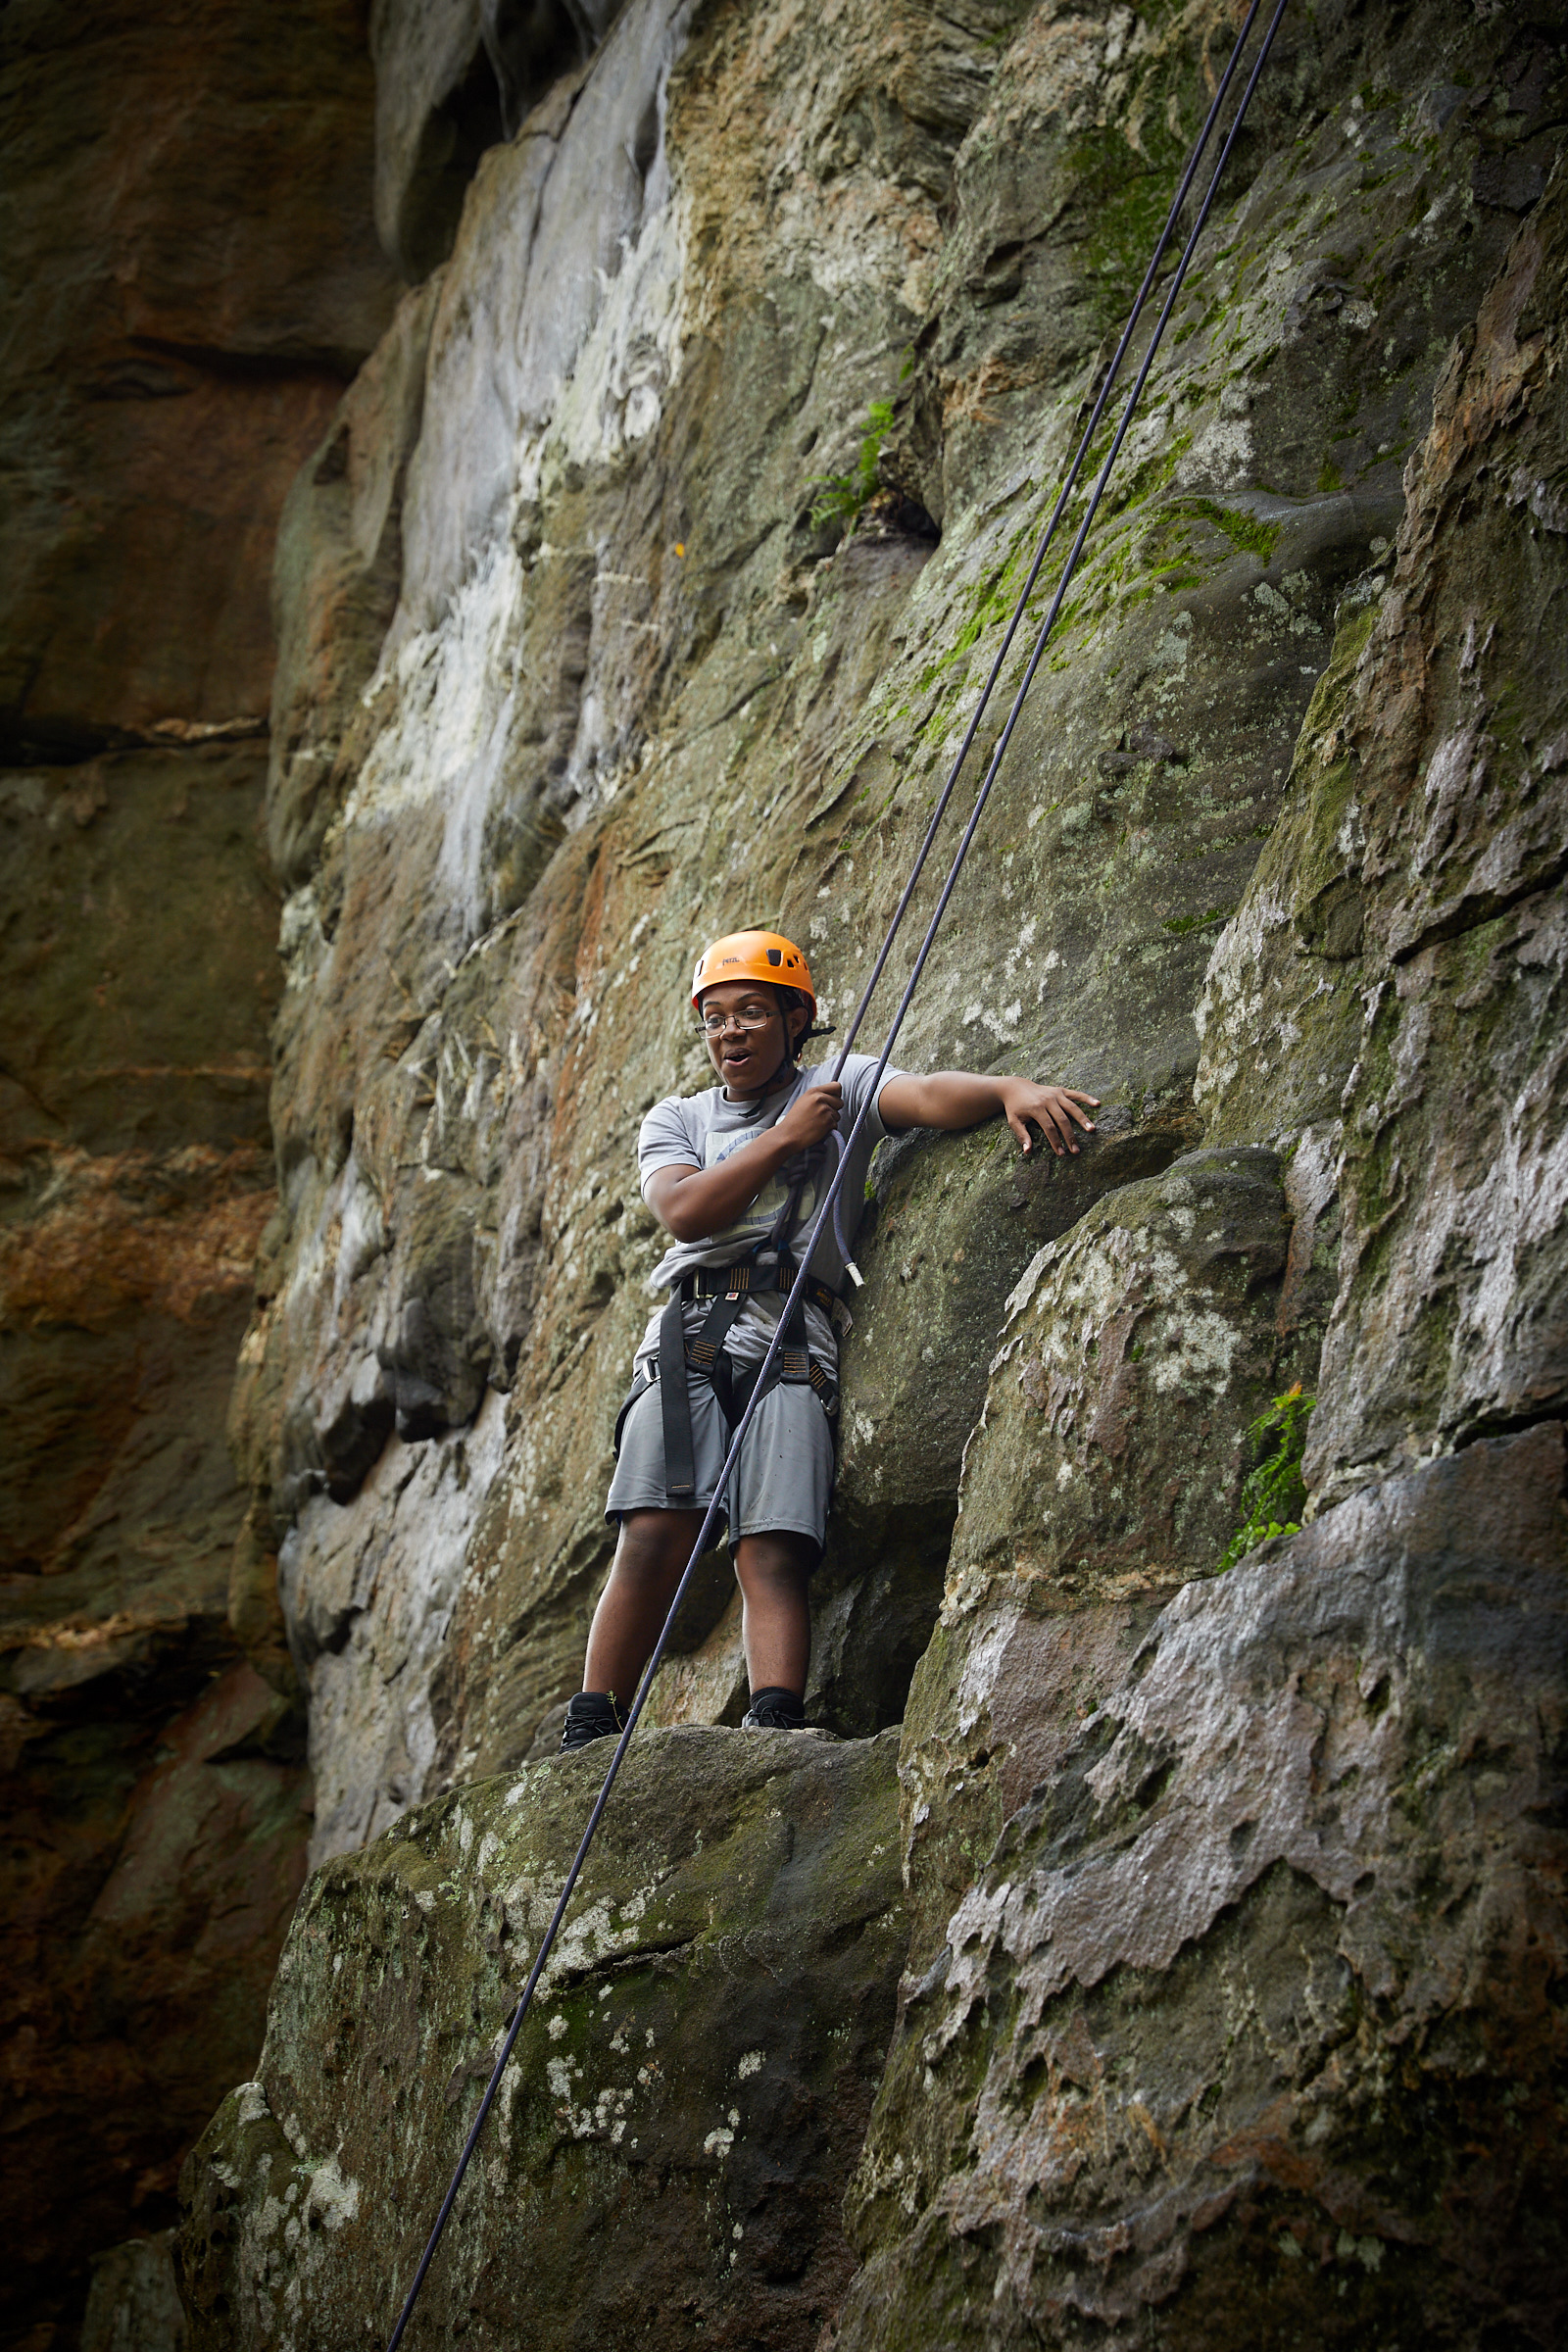 St. Paul School at Outward Bound course at Shaffer Rock, Michaux State Park, PA. [image © Matthew Rakola]